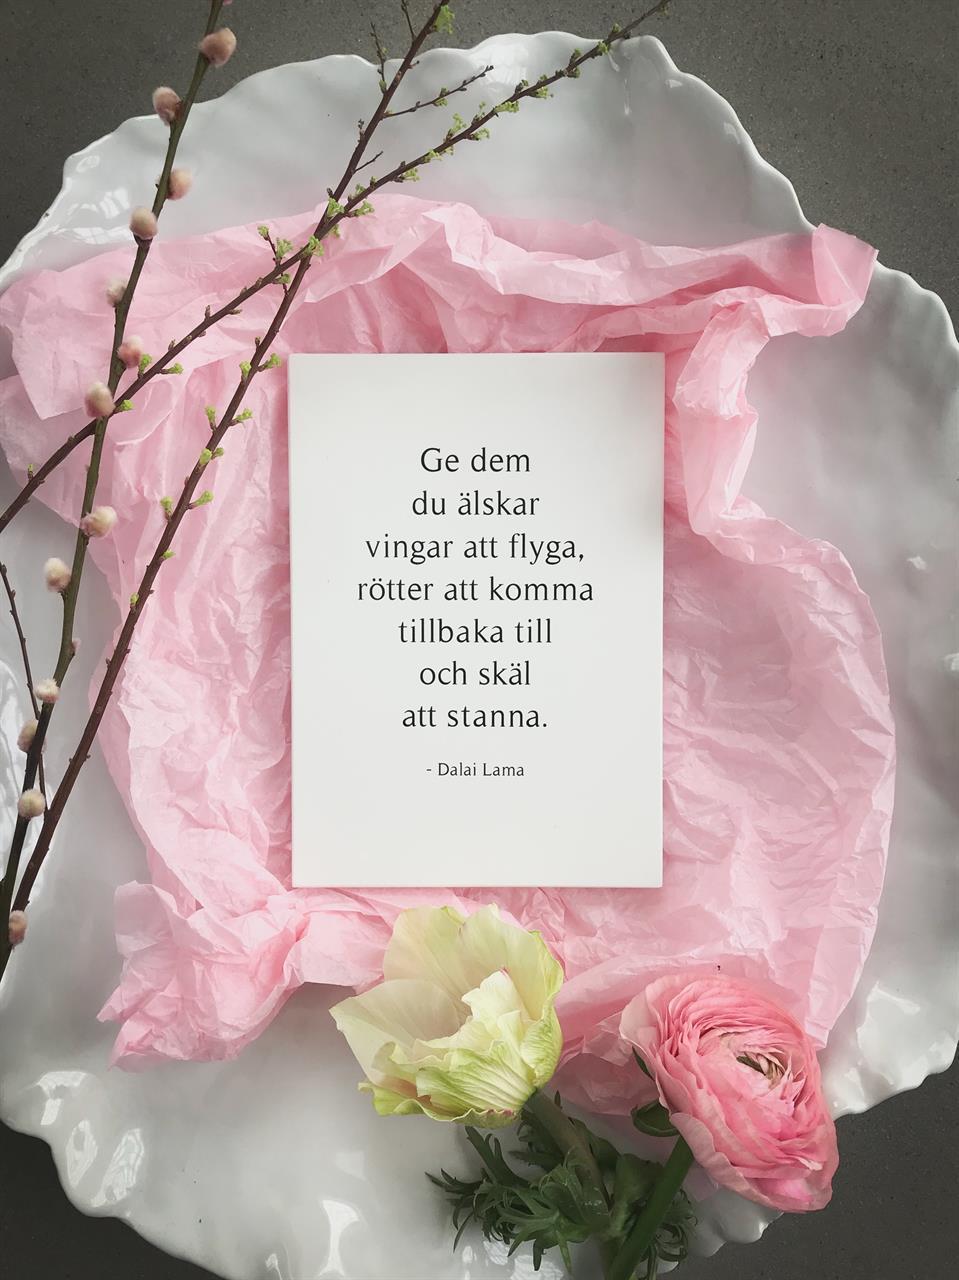 Trätavla A5, Dalai lama svenska, vit/svart text